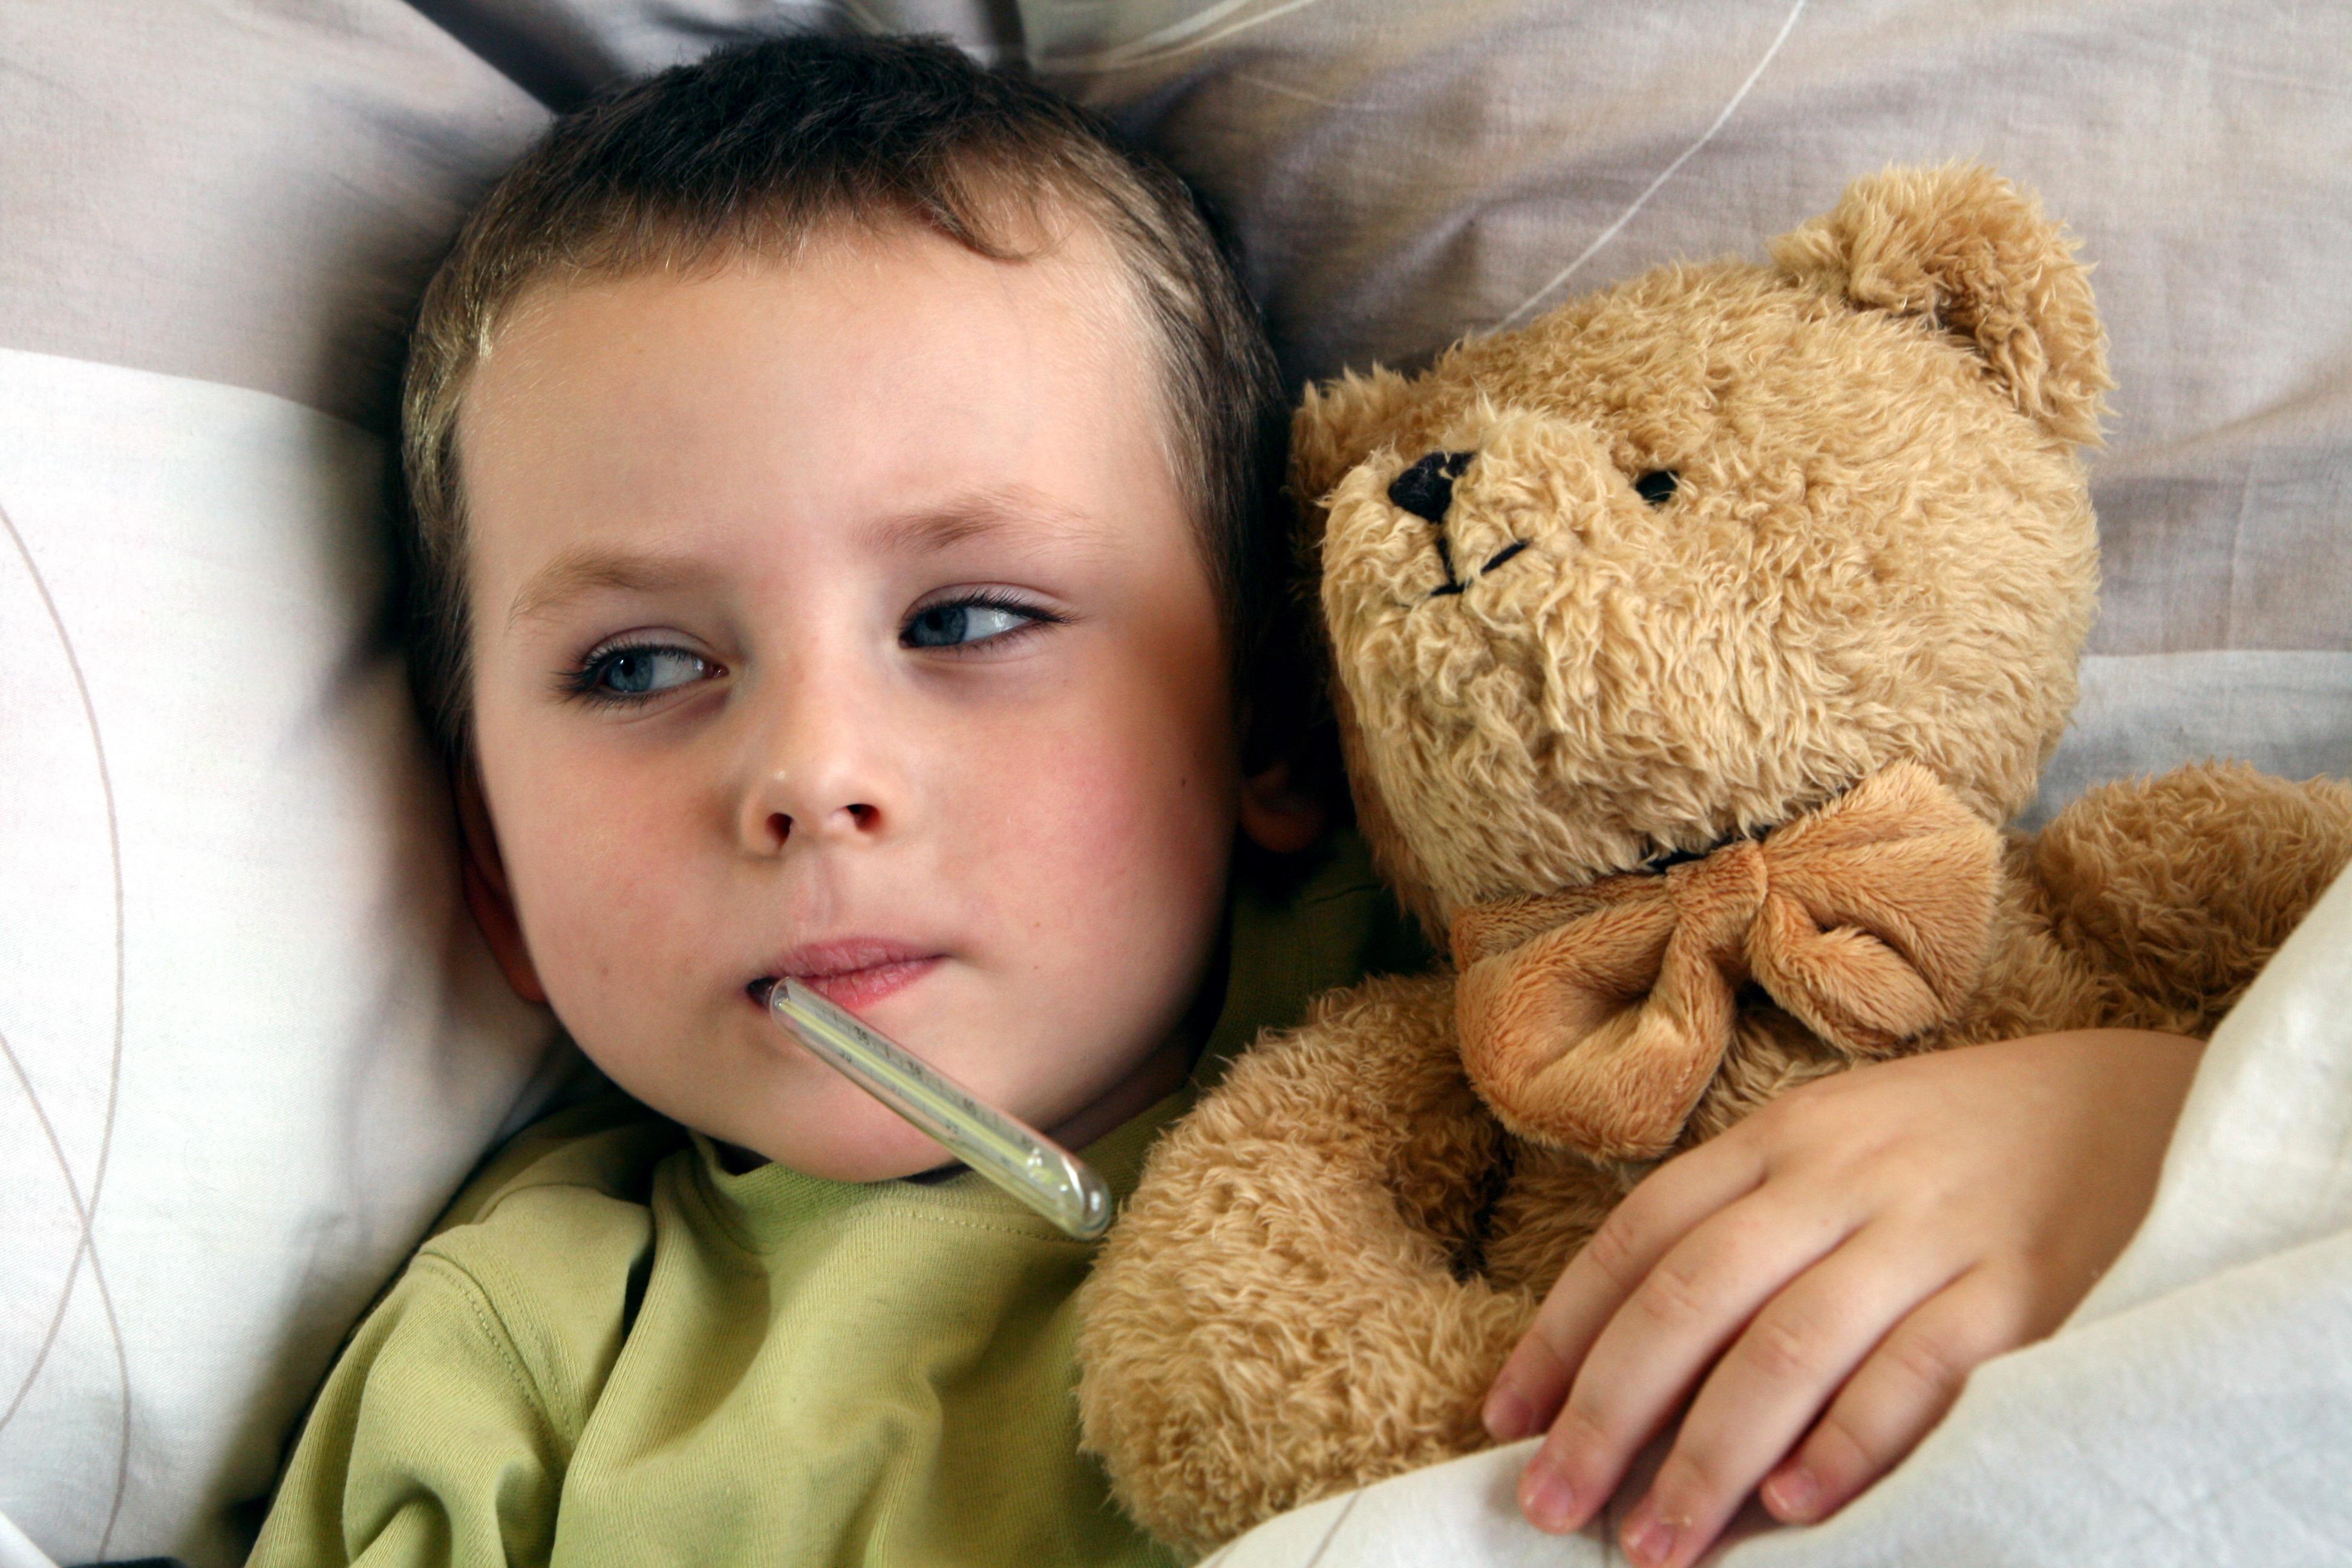 Sin 1000 consultaziuns tar il medi èn anc adina 30 pervi da la grippa.